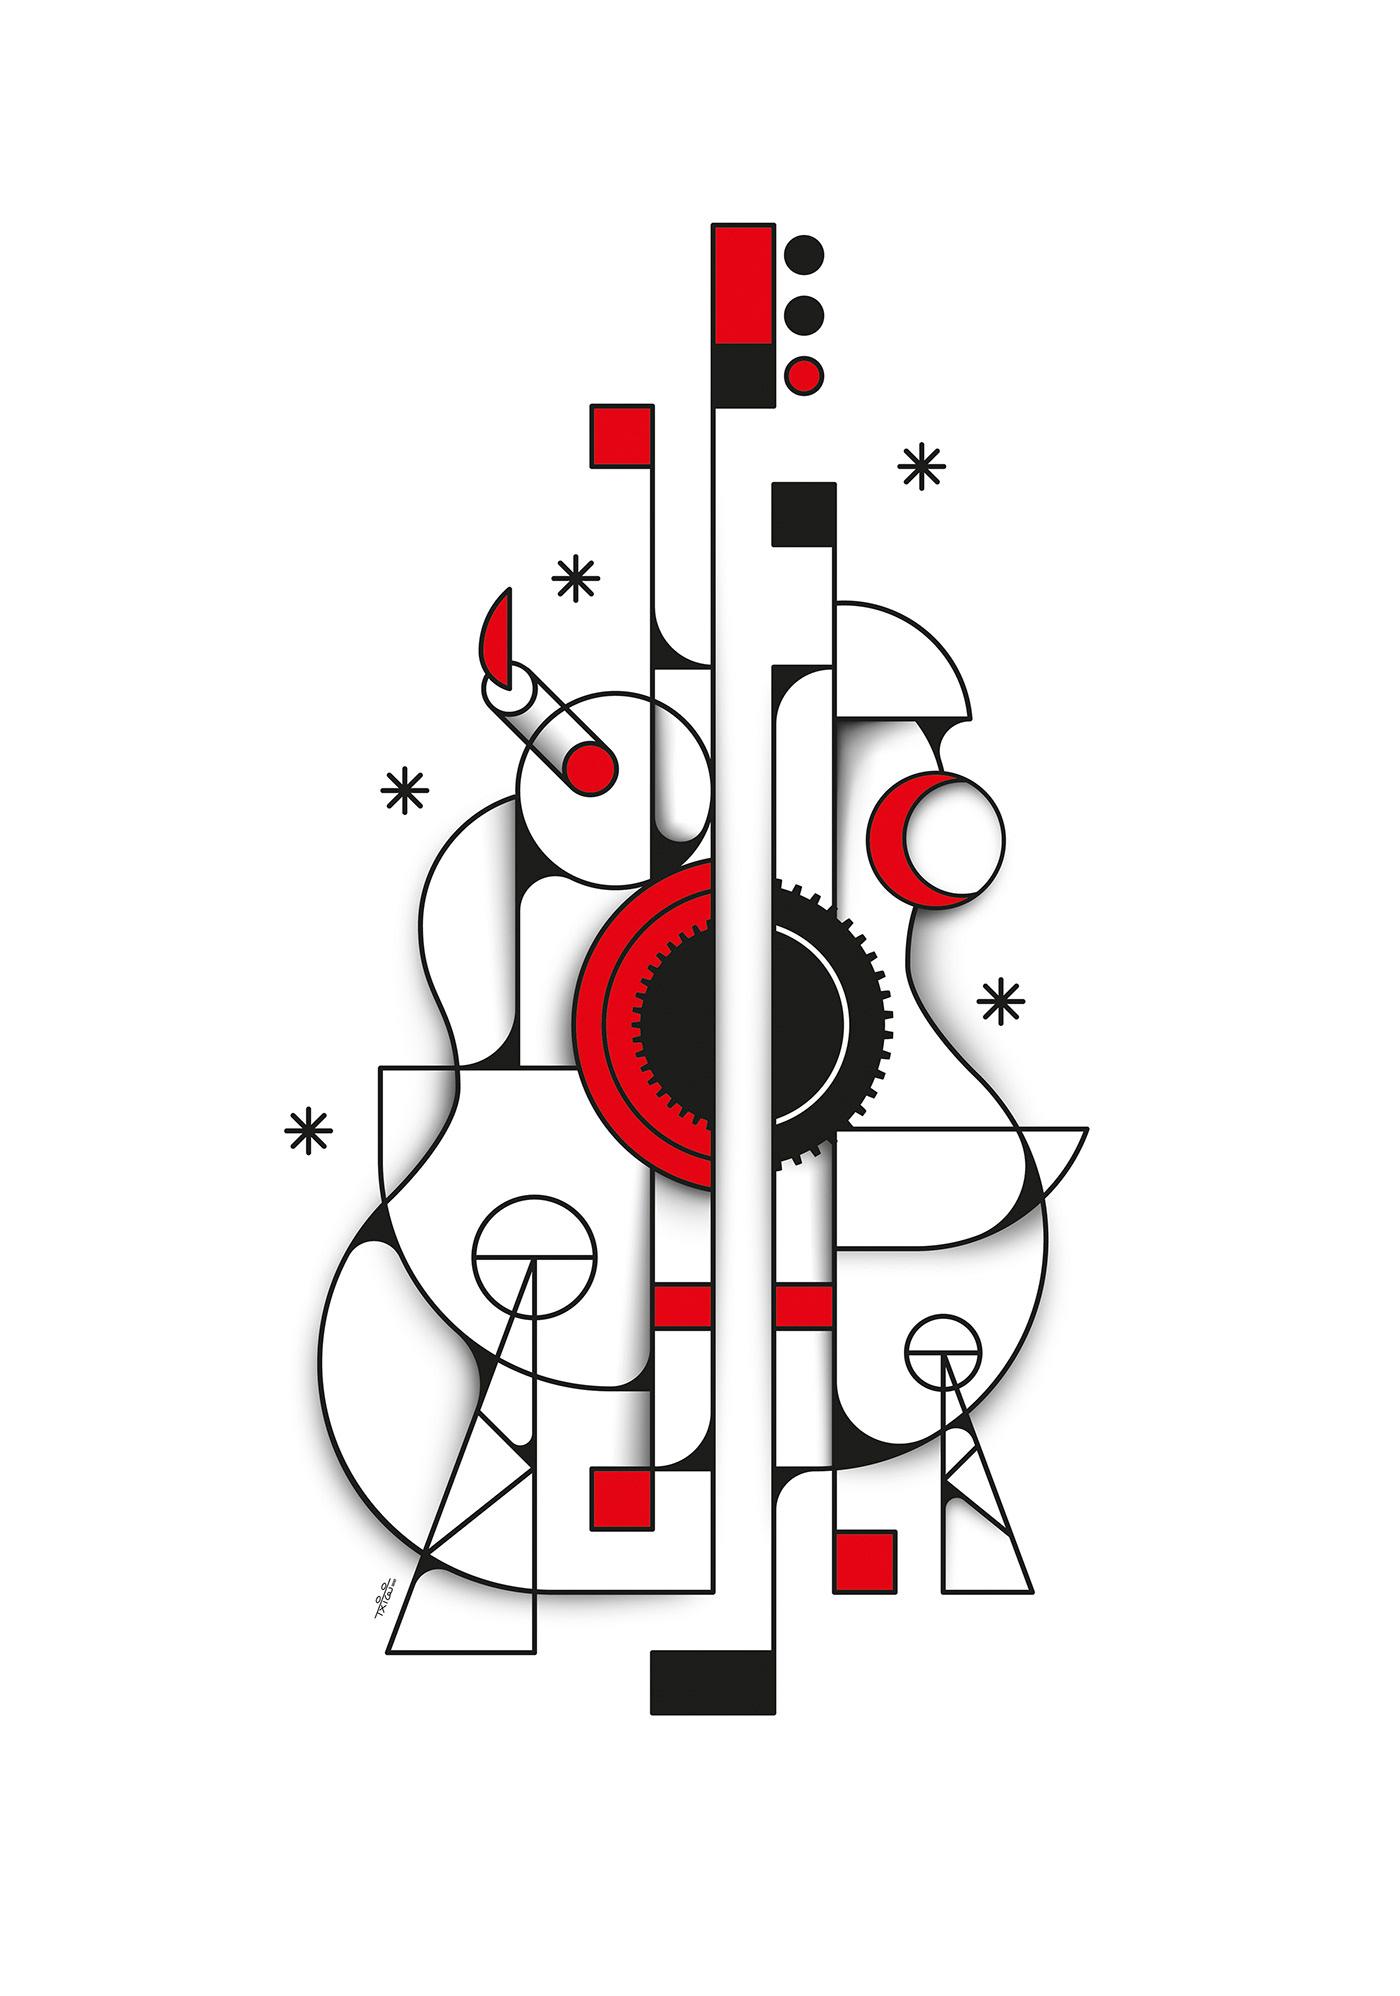 Cubismo festival Flamenco Guitarra ilustracion lineas rojo cubism ILLUSTRATION  vector art